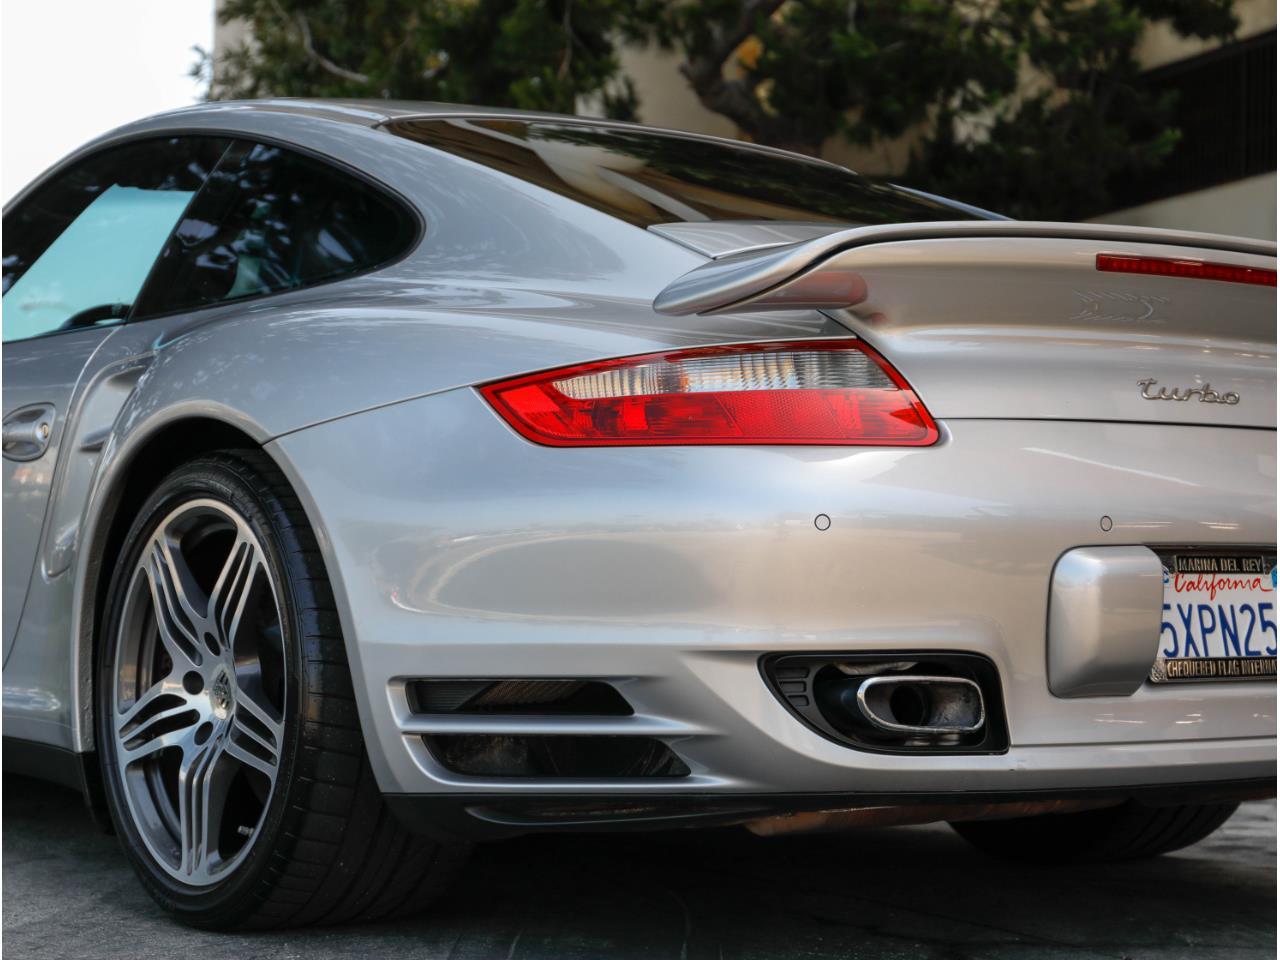 Large Picture of 2007 Porsche 911 Turbo - $71,500.00 - QG8Z